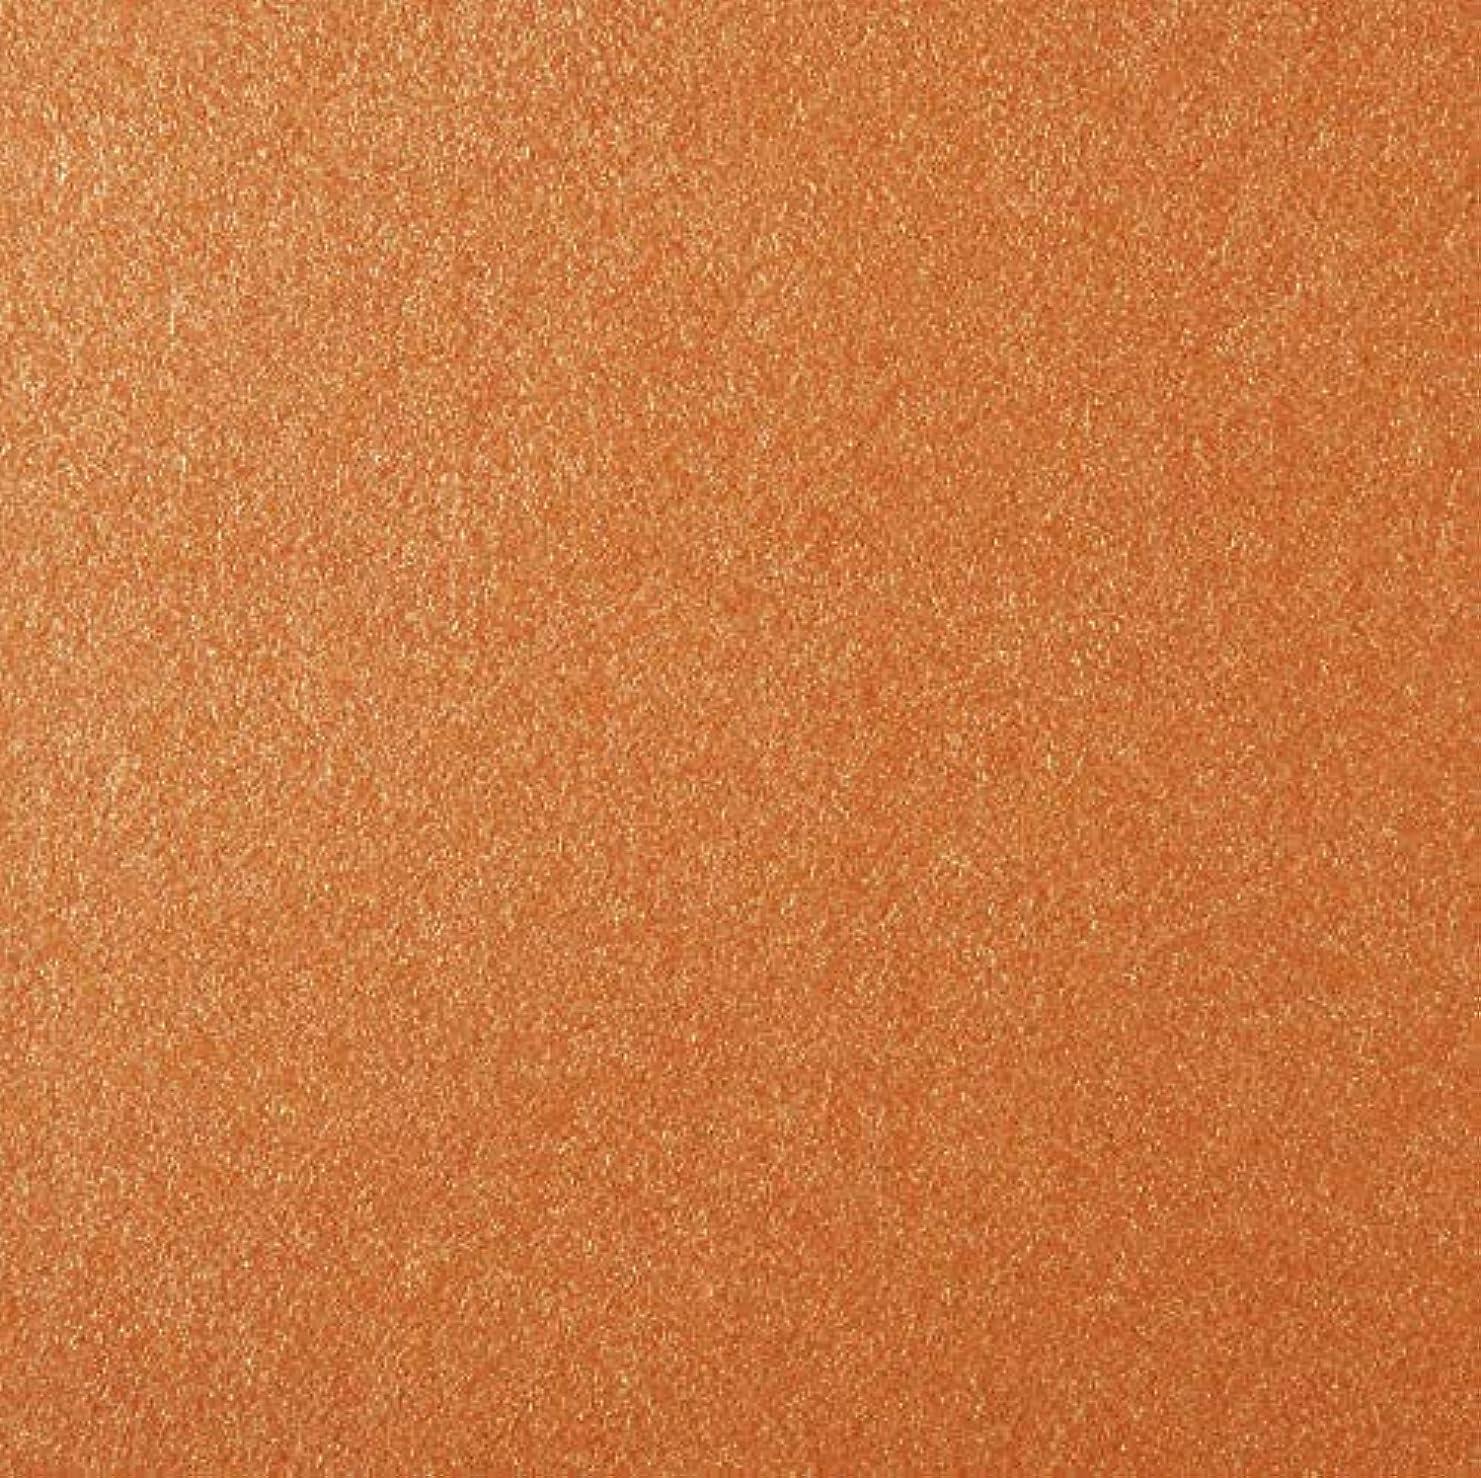 Cardmaker Series GX-CF-180 Card Stock Pearl Copper 8.5X11 25Pk Multicolor